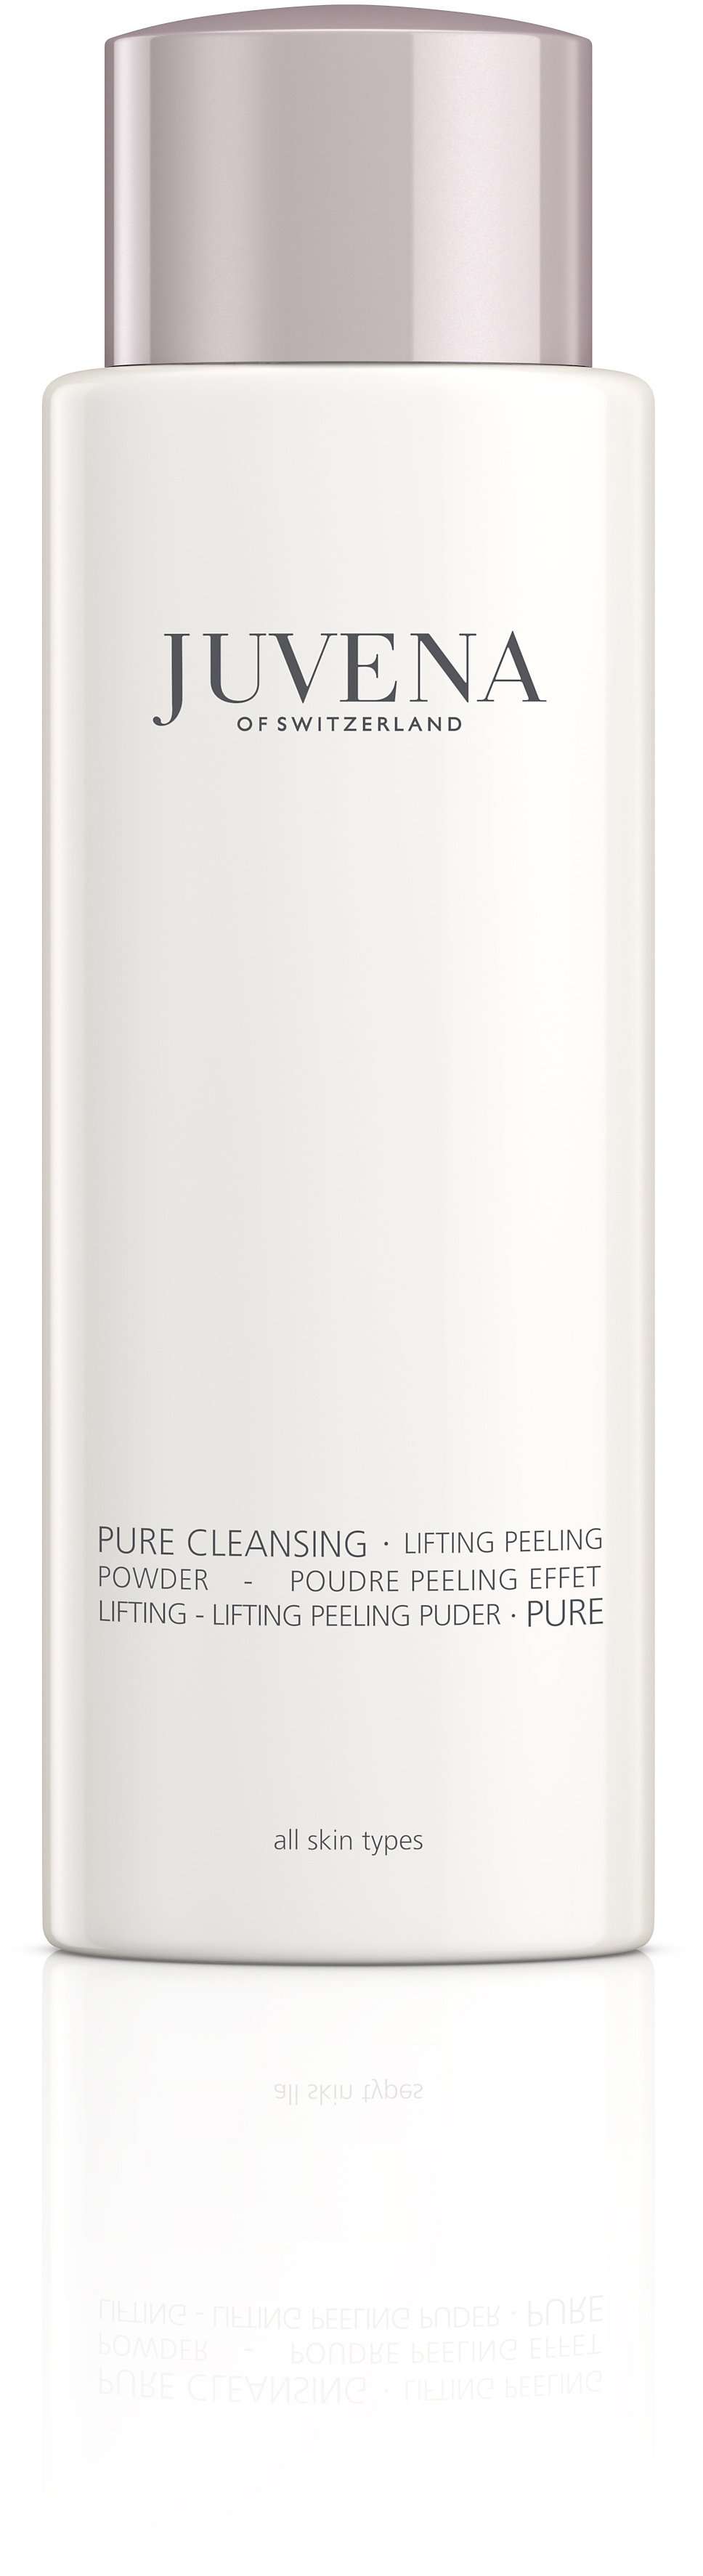 Juvena Pure Lifting Peeling Powder 90 g